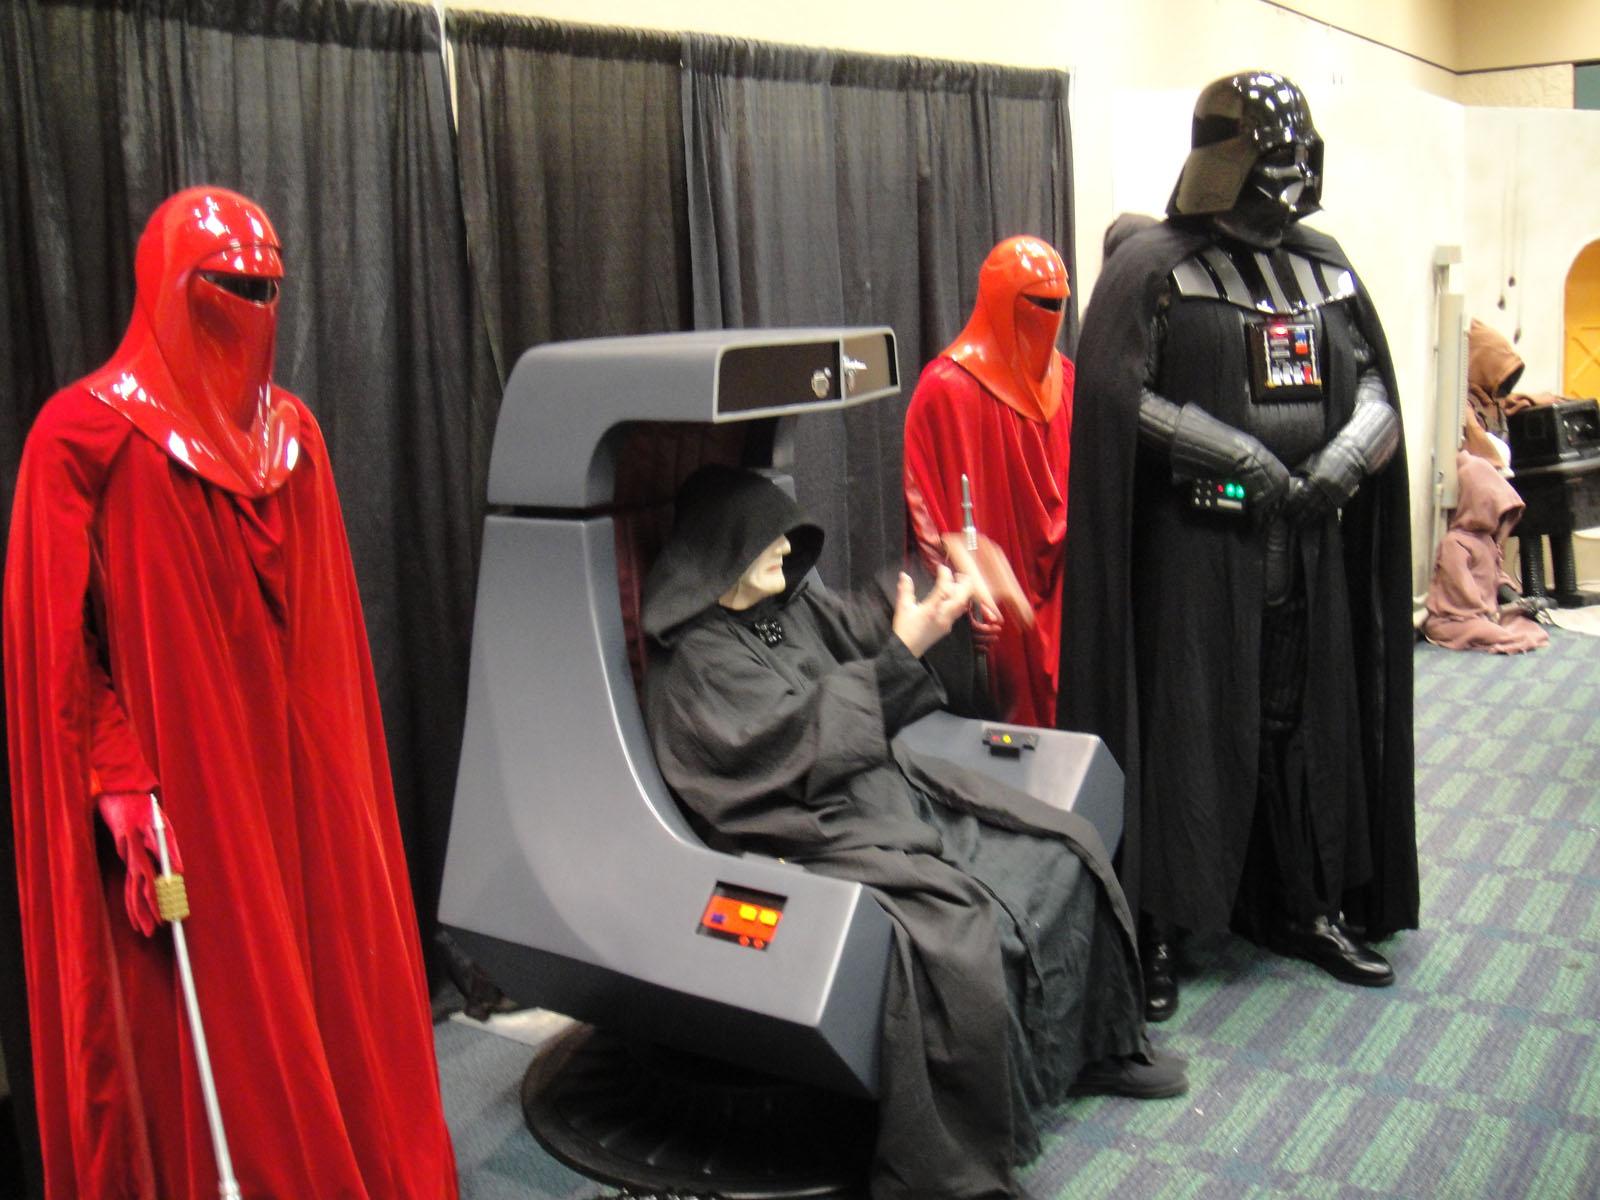 File Star Wars Celebration V 501st Room The Emperor Royal Guards And Darth Vader 4940990136 Jpg Wikimedia Commons